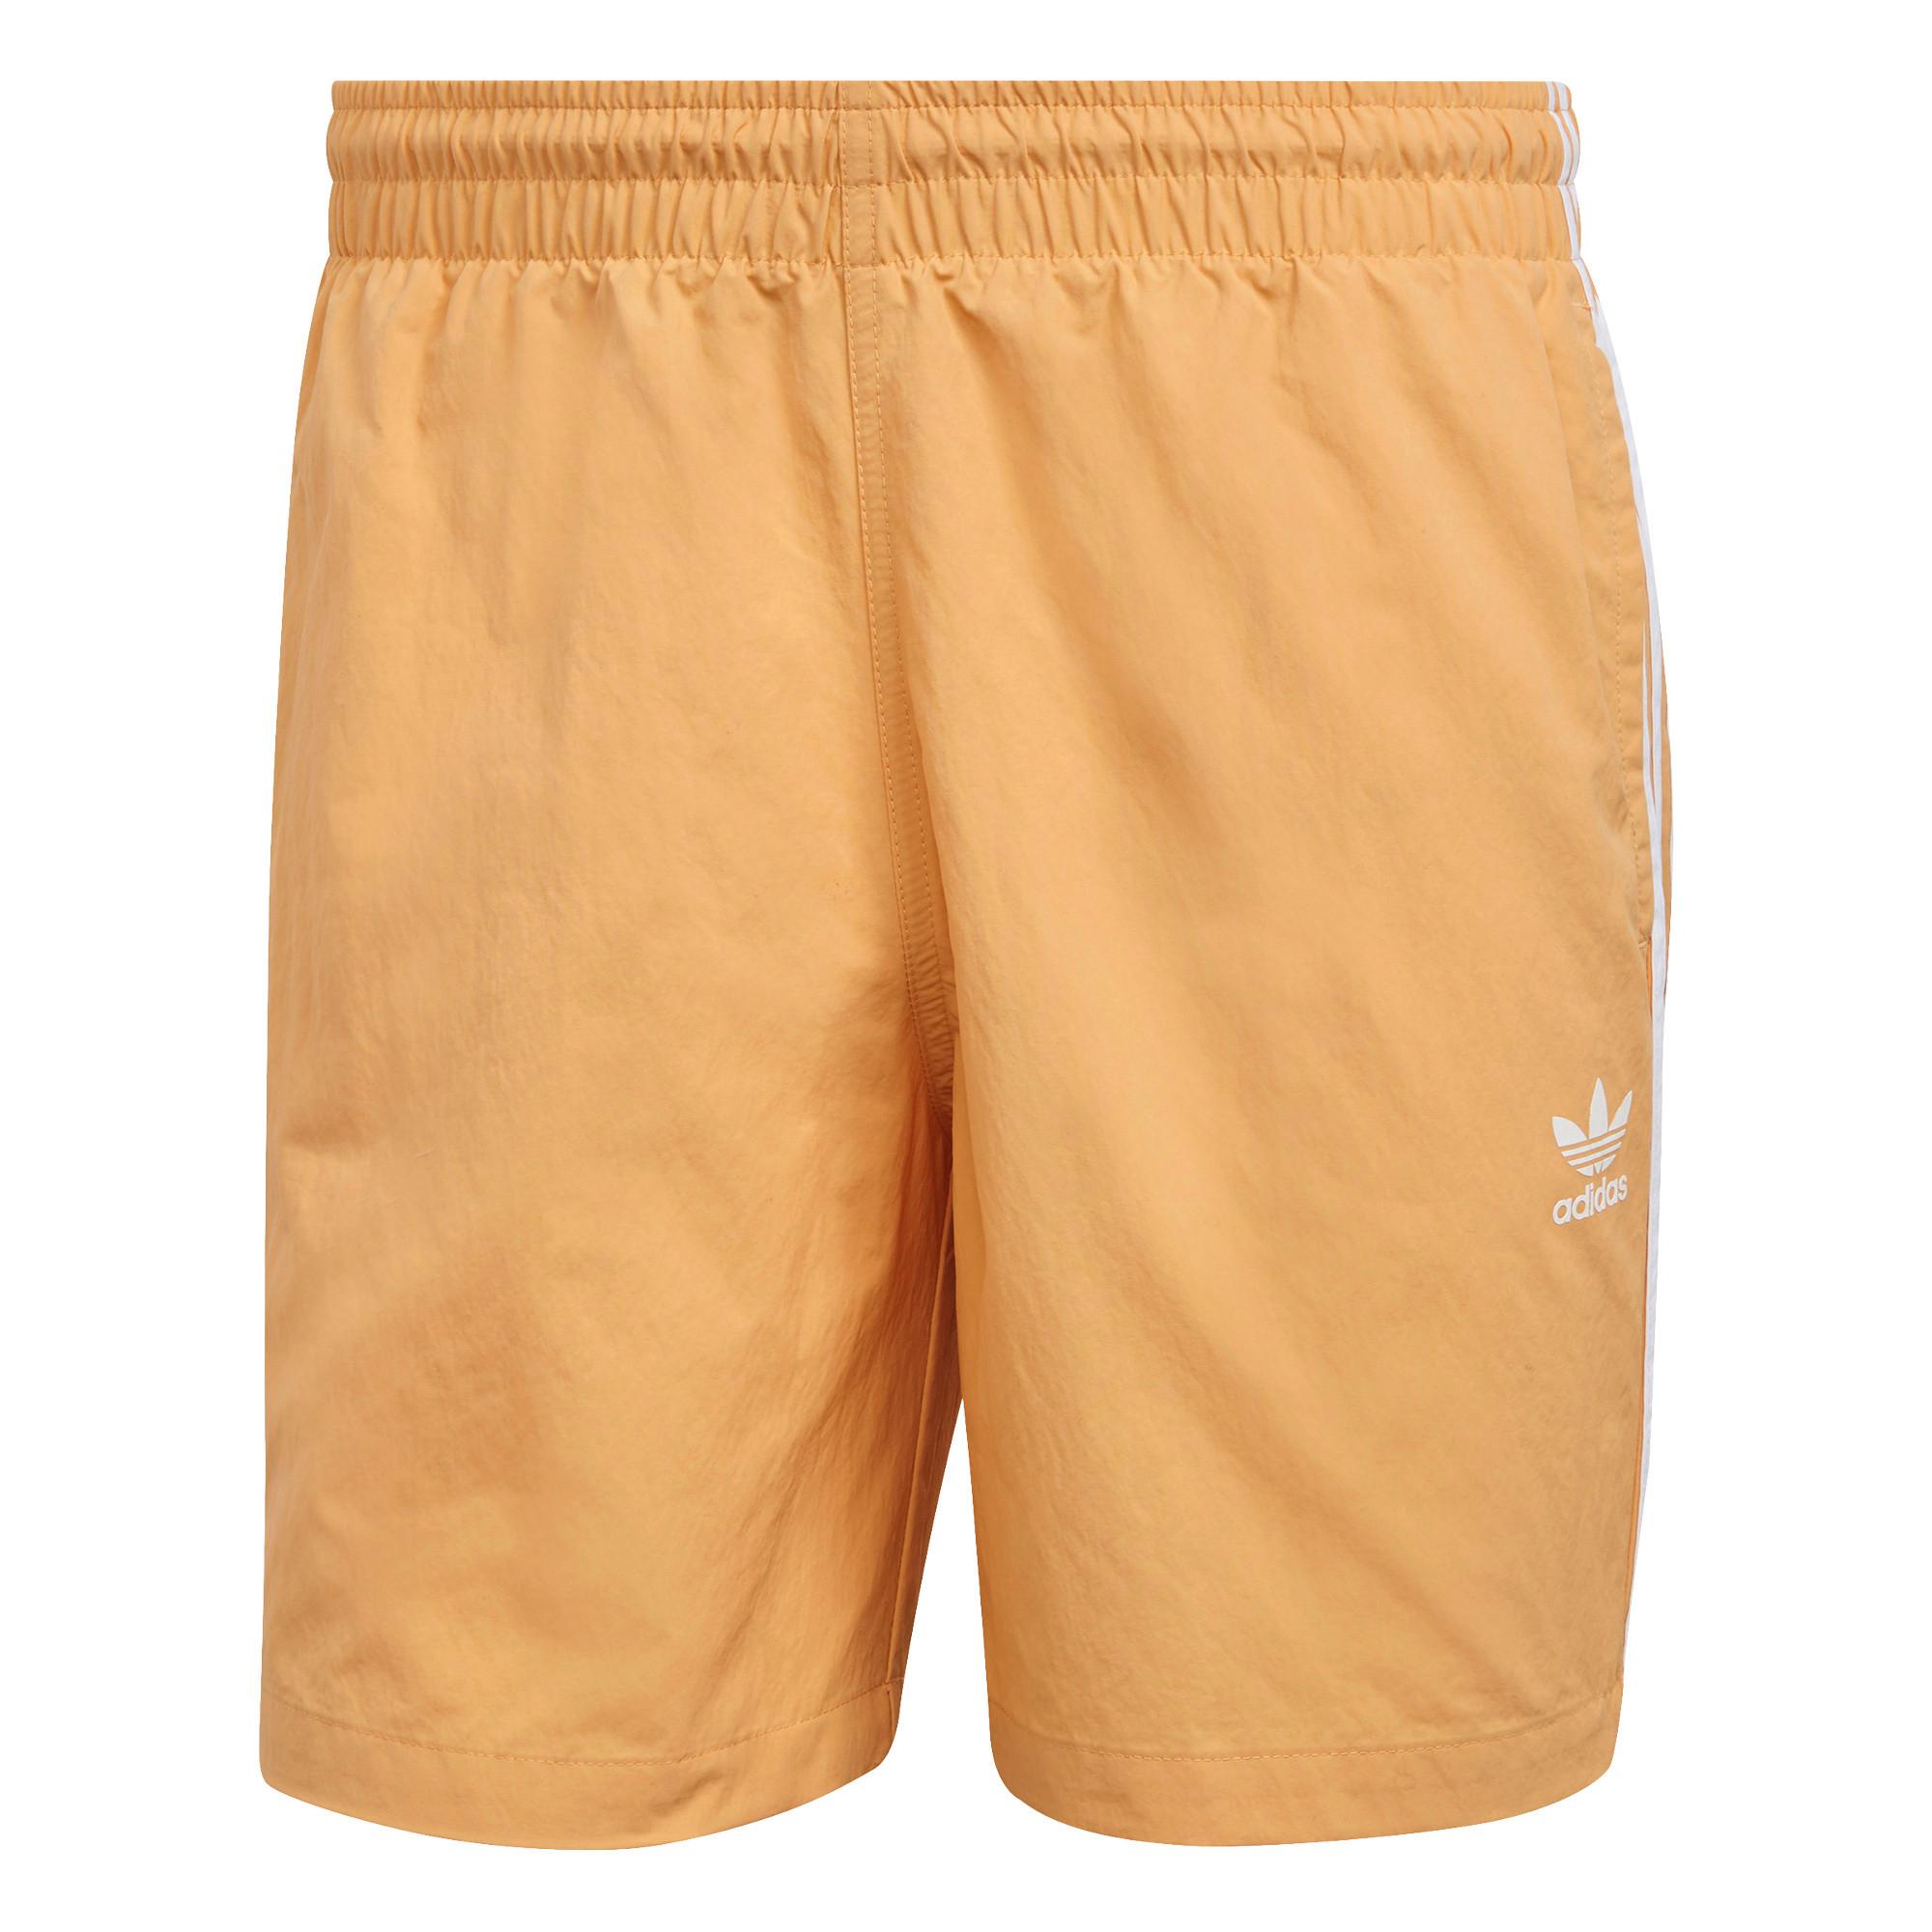 Short da nuoto adicolor classics 3-stripes, Arancione, large image number 0